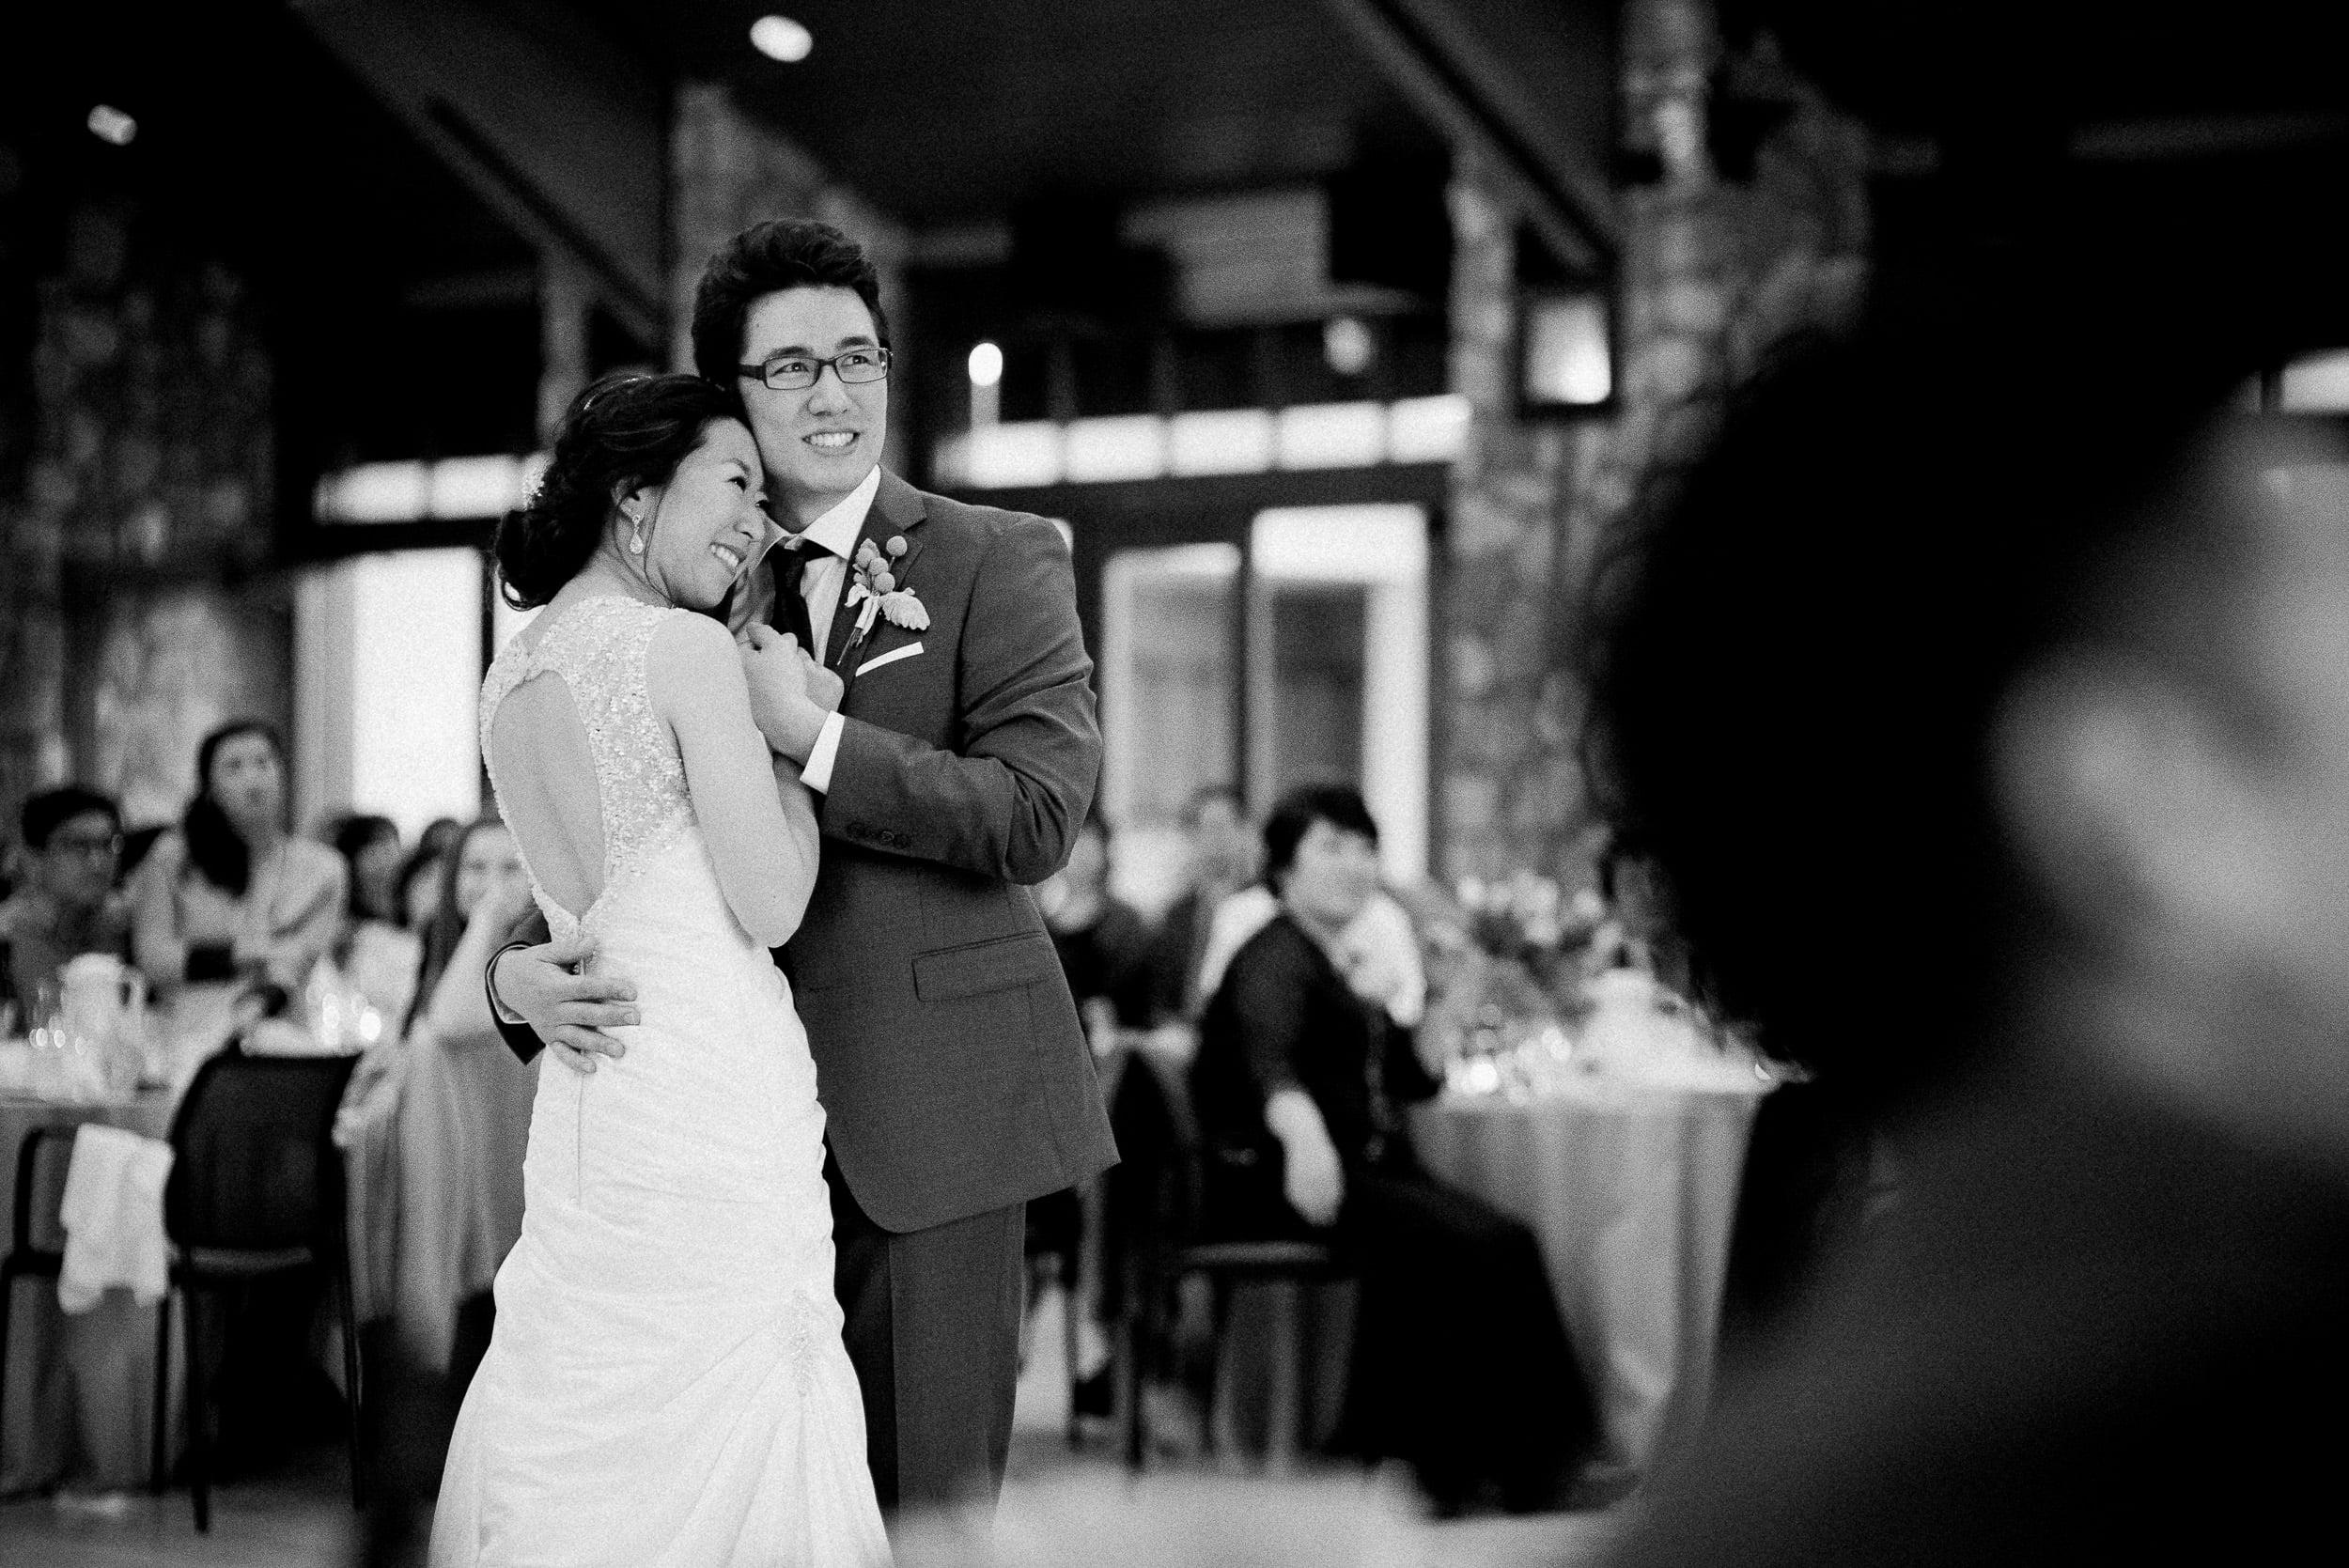 Documentary Wedding Photography by Annie Hall photography at Moraga Valley Church wedding 091.jpg